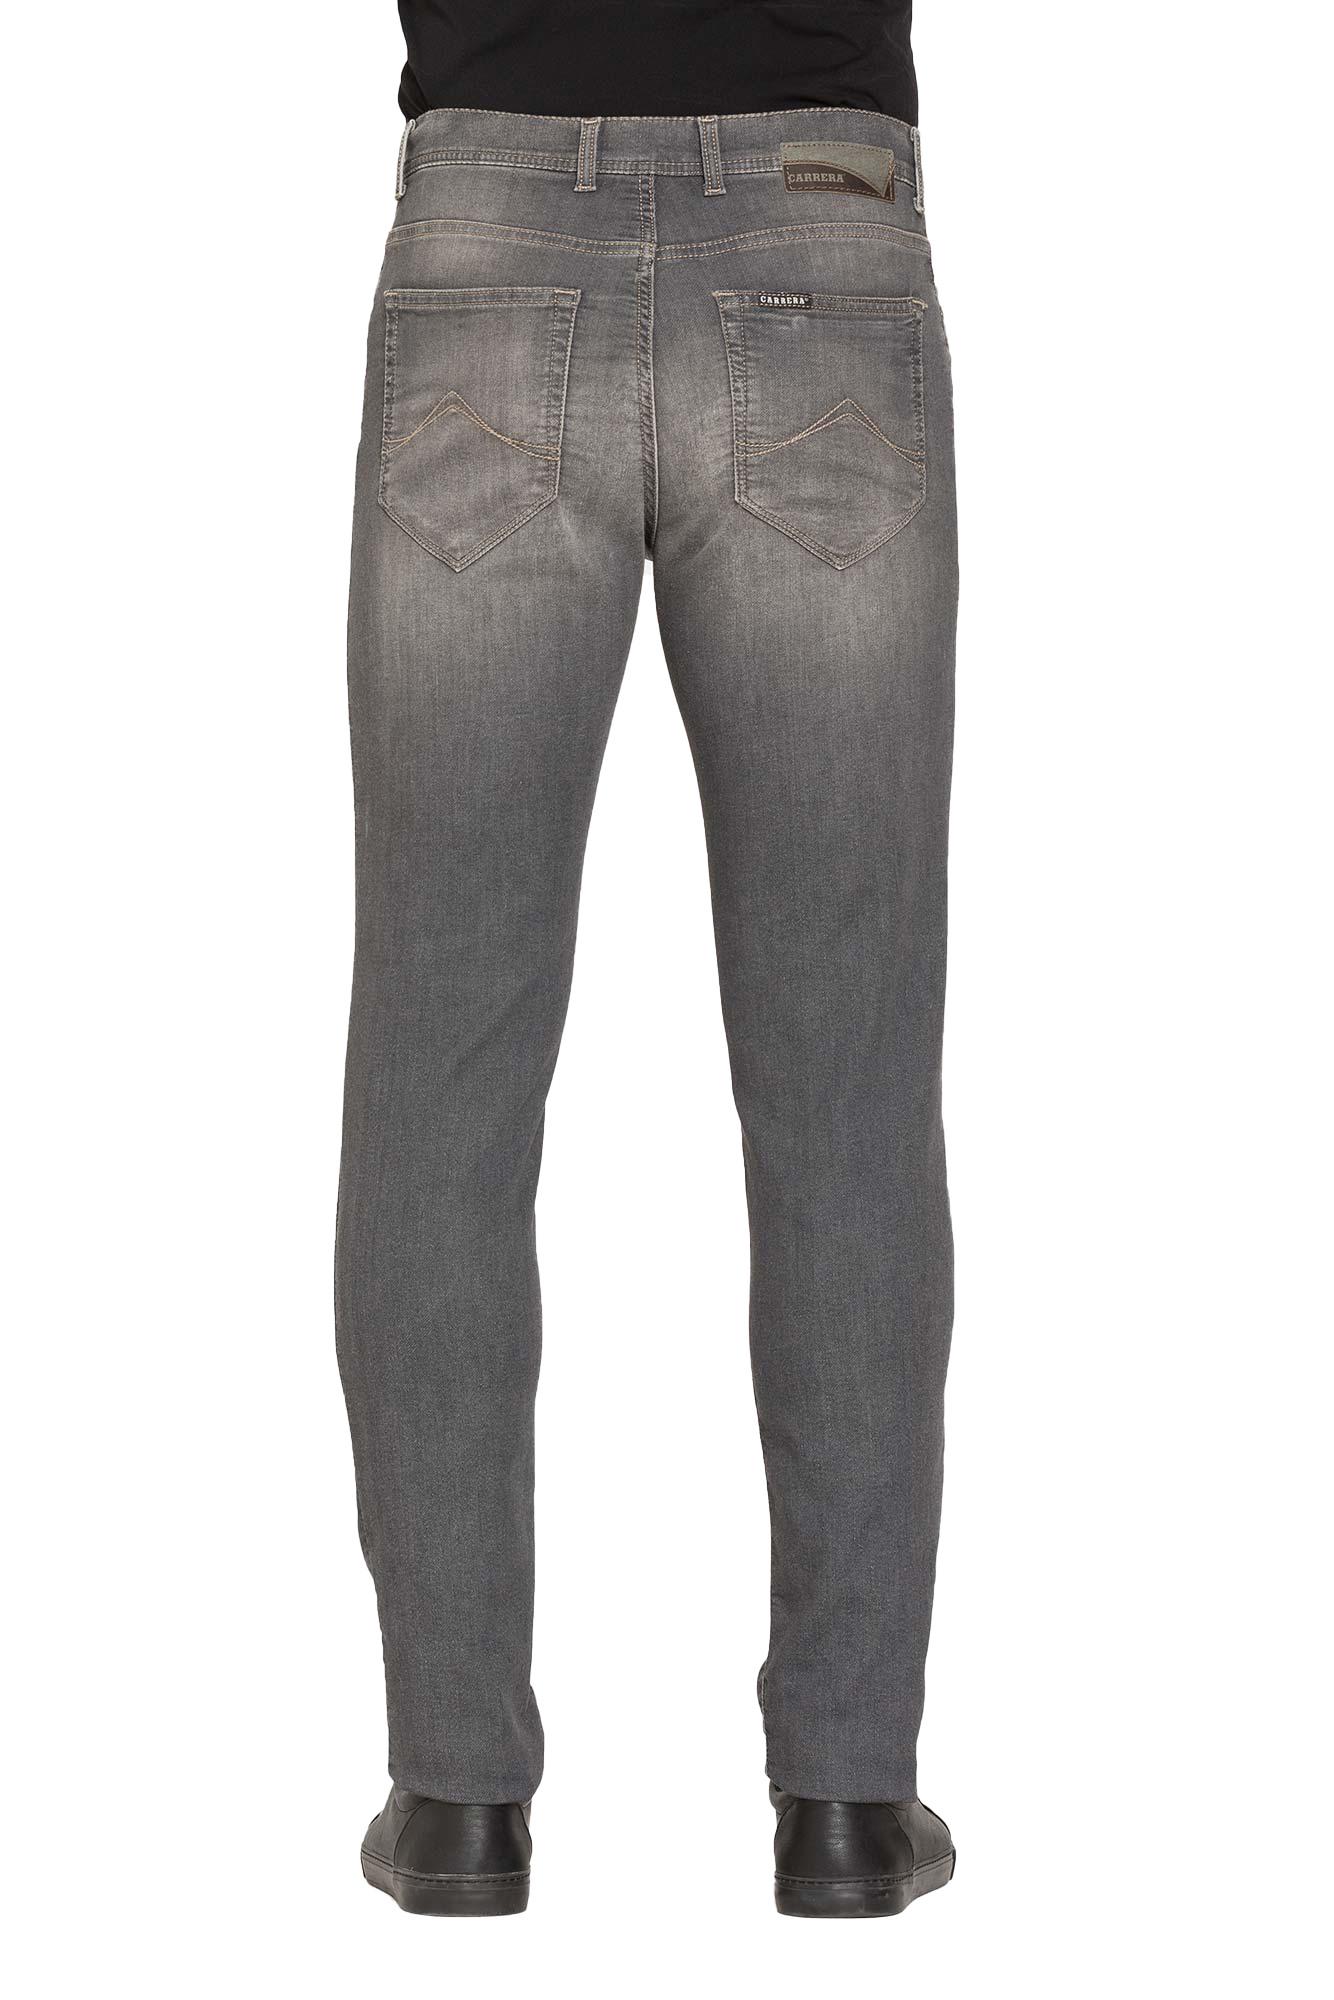 Carrera-Jeans-Jeans-per-uomo-tinta-unita miniatura 15